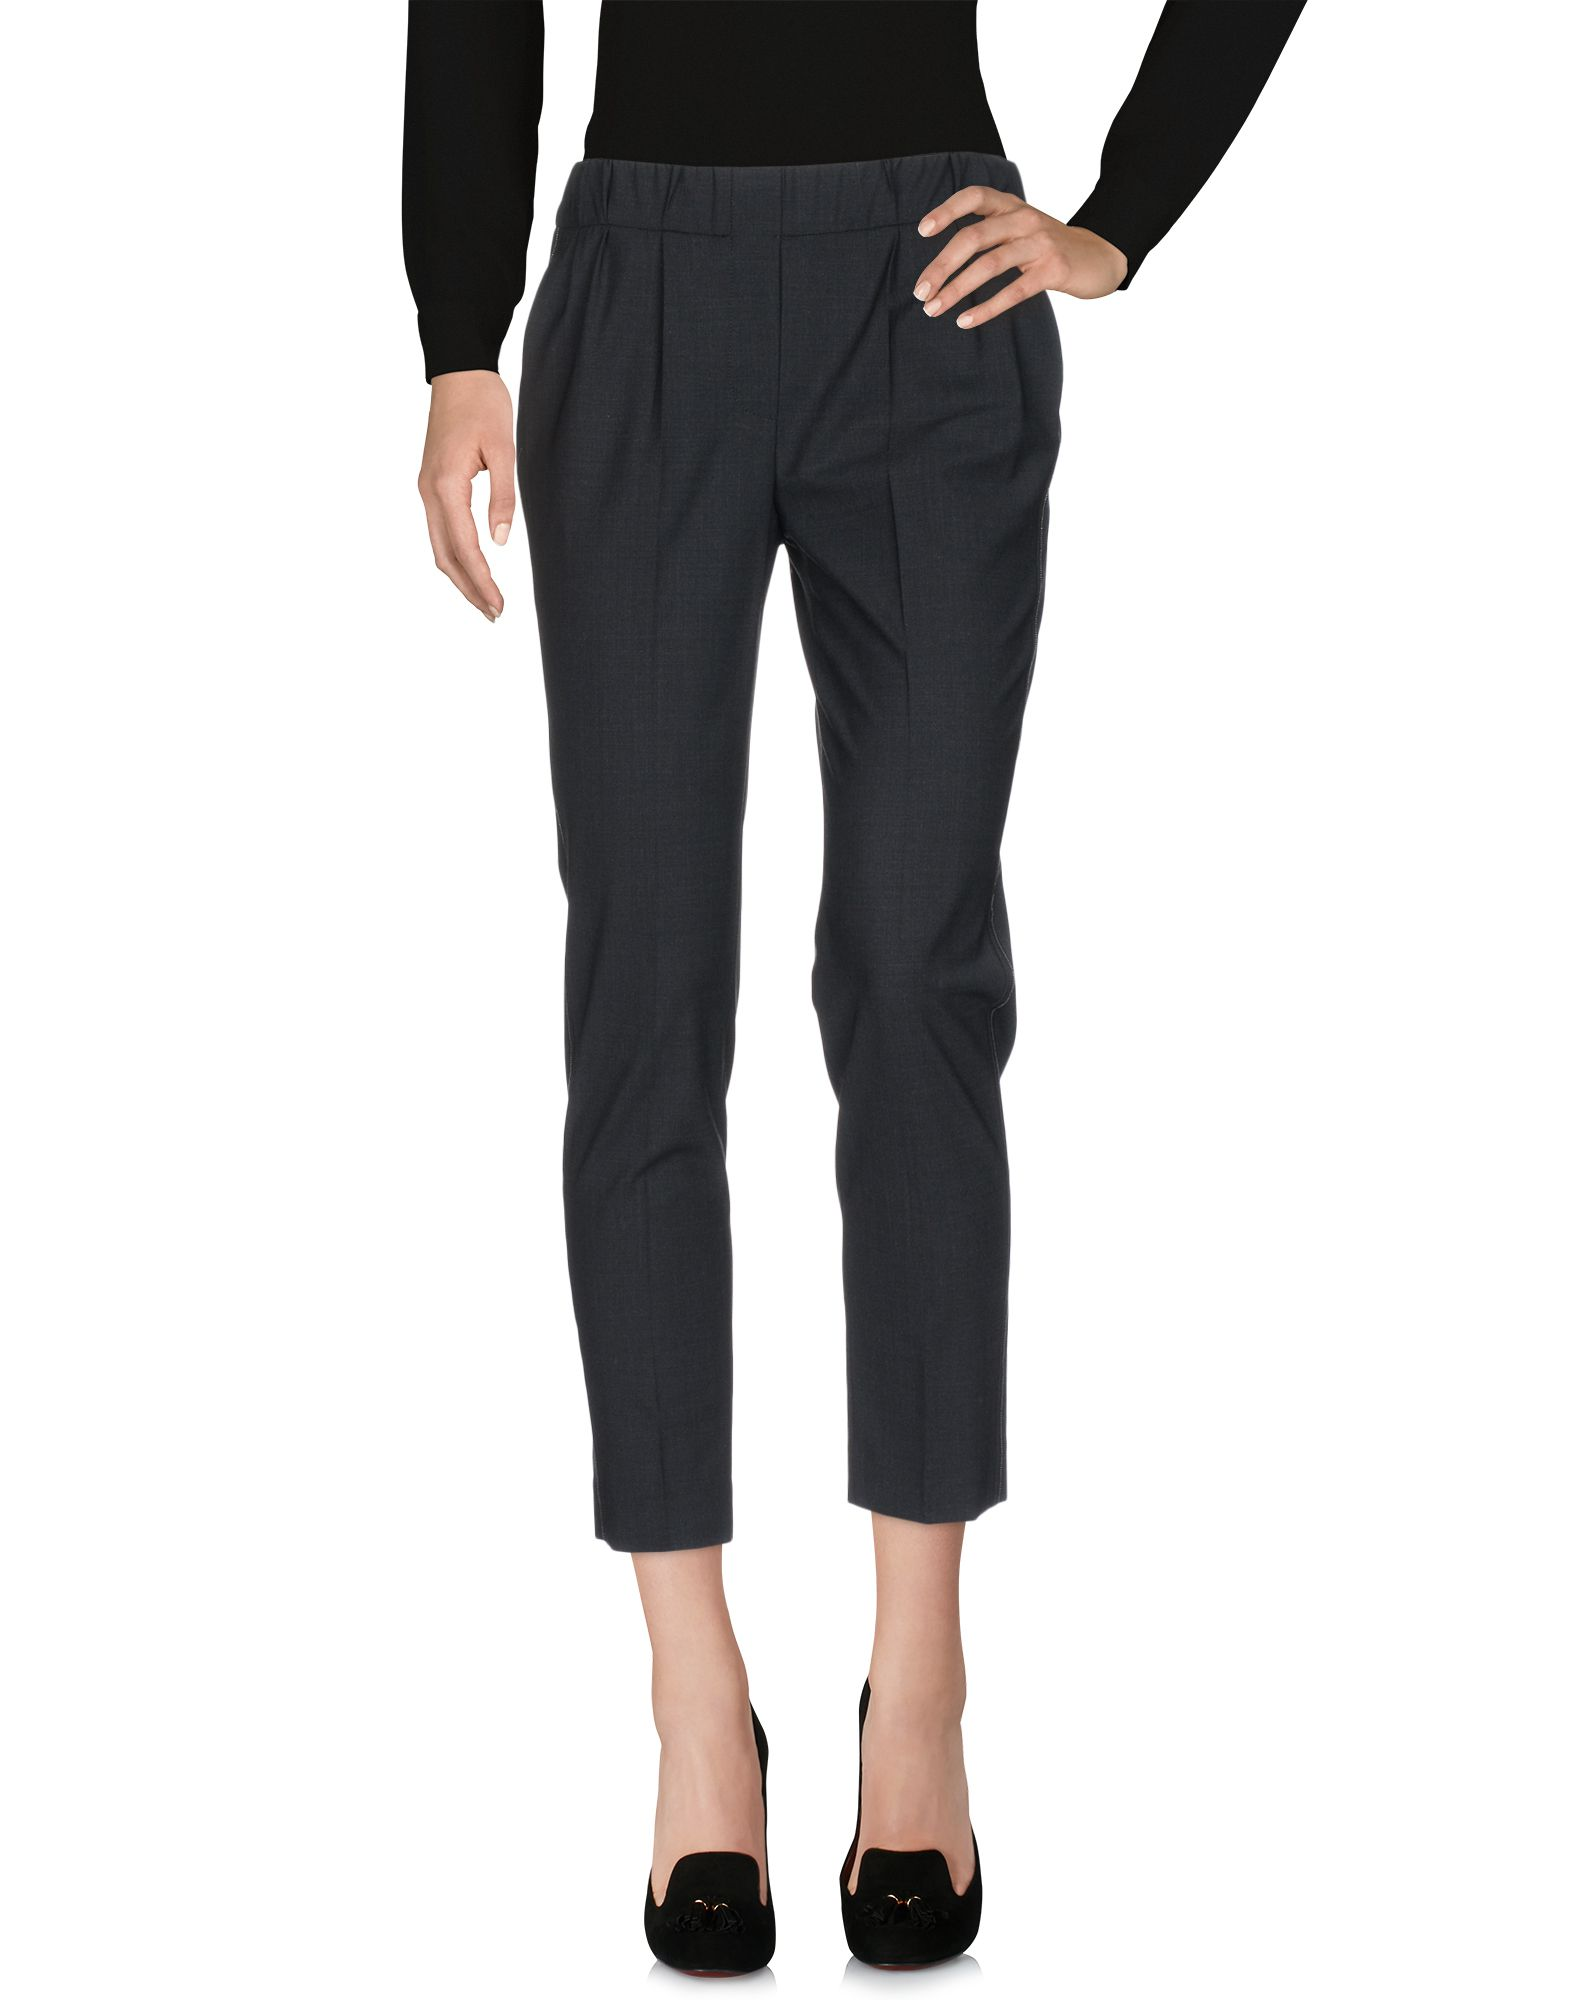 Pantalone Brunello Cucinelli Donna - Acquista online su DYIYNuh5NX